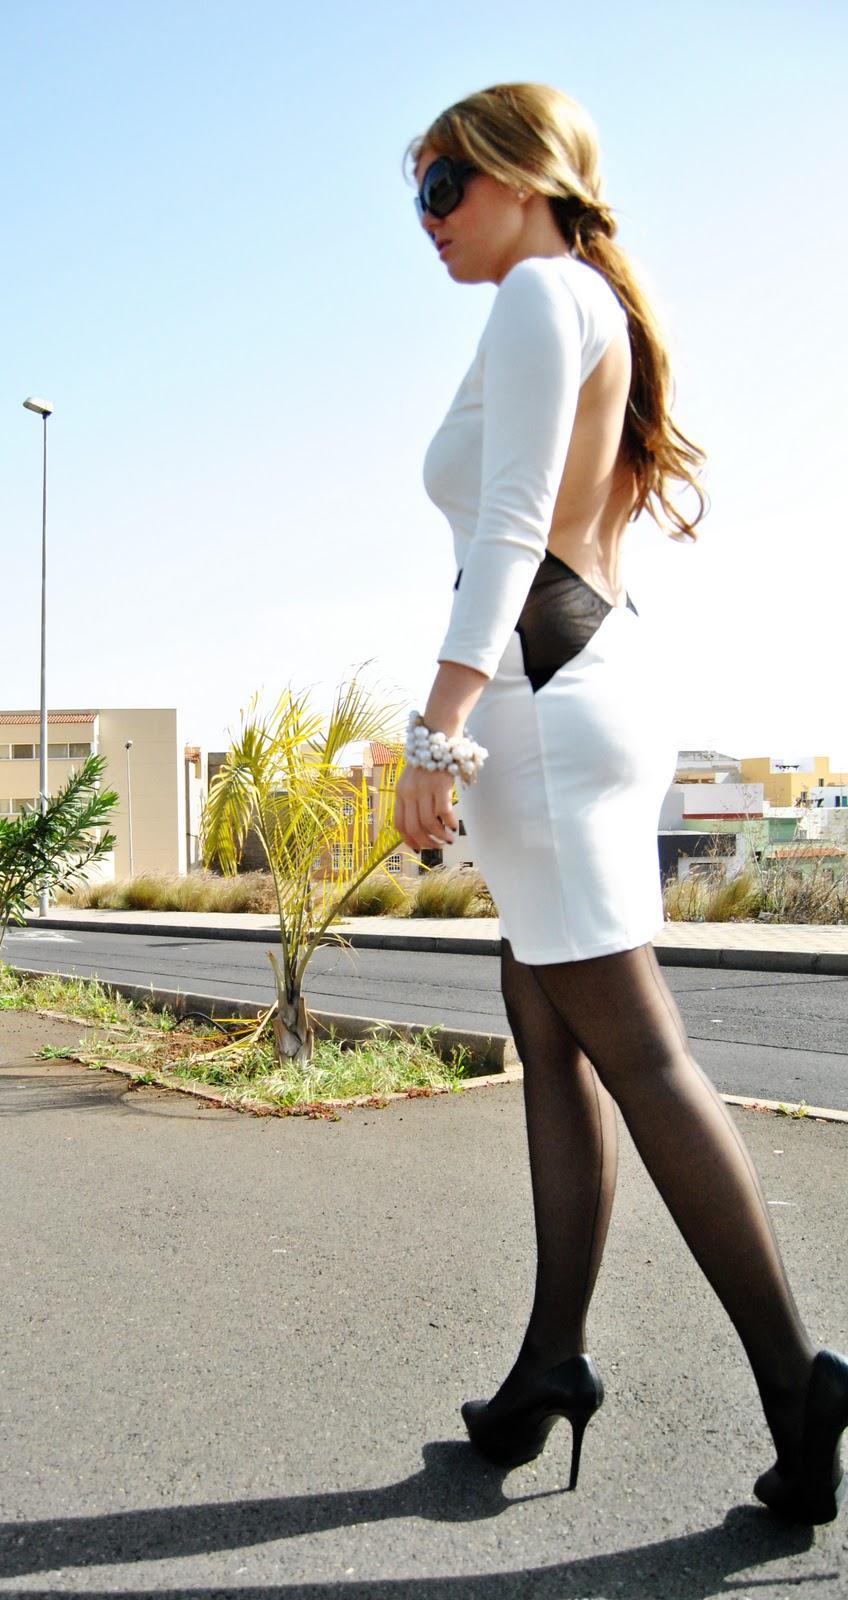 nery hdez, blake lively dress, gossip girl style, cavalli dress